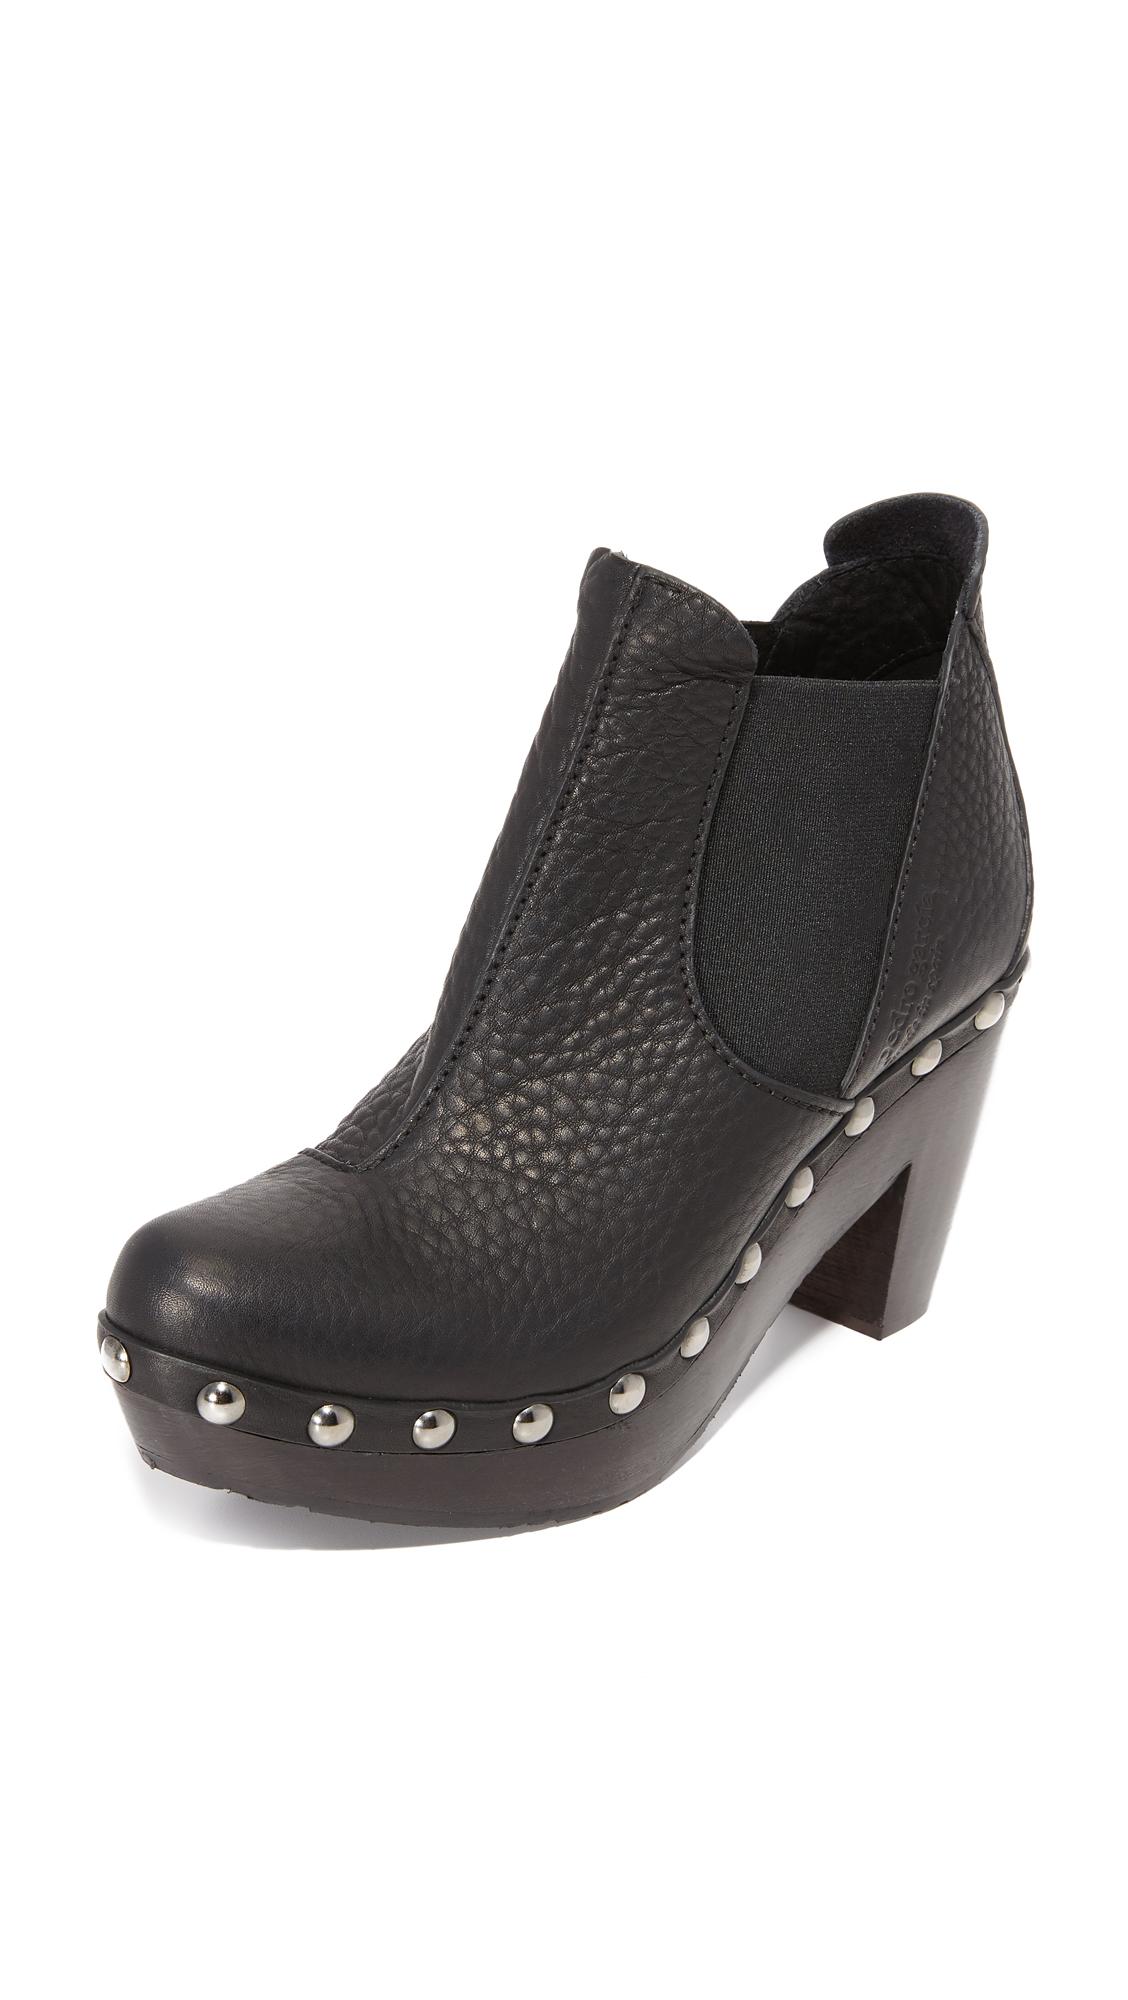 Pedro Garcia Karen Platform Booties - Black